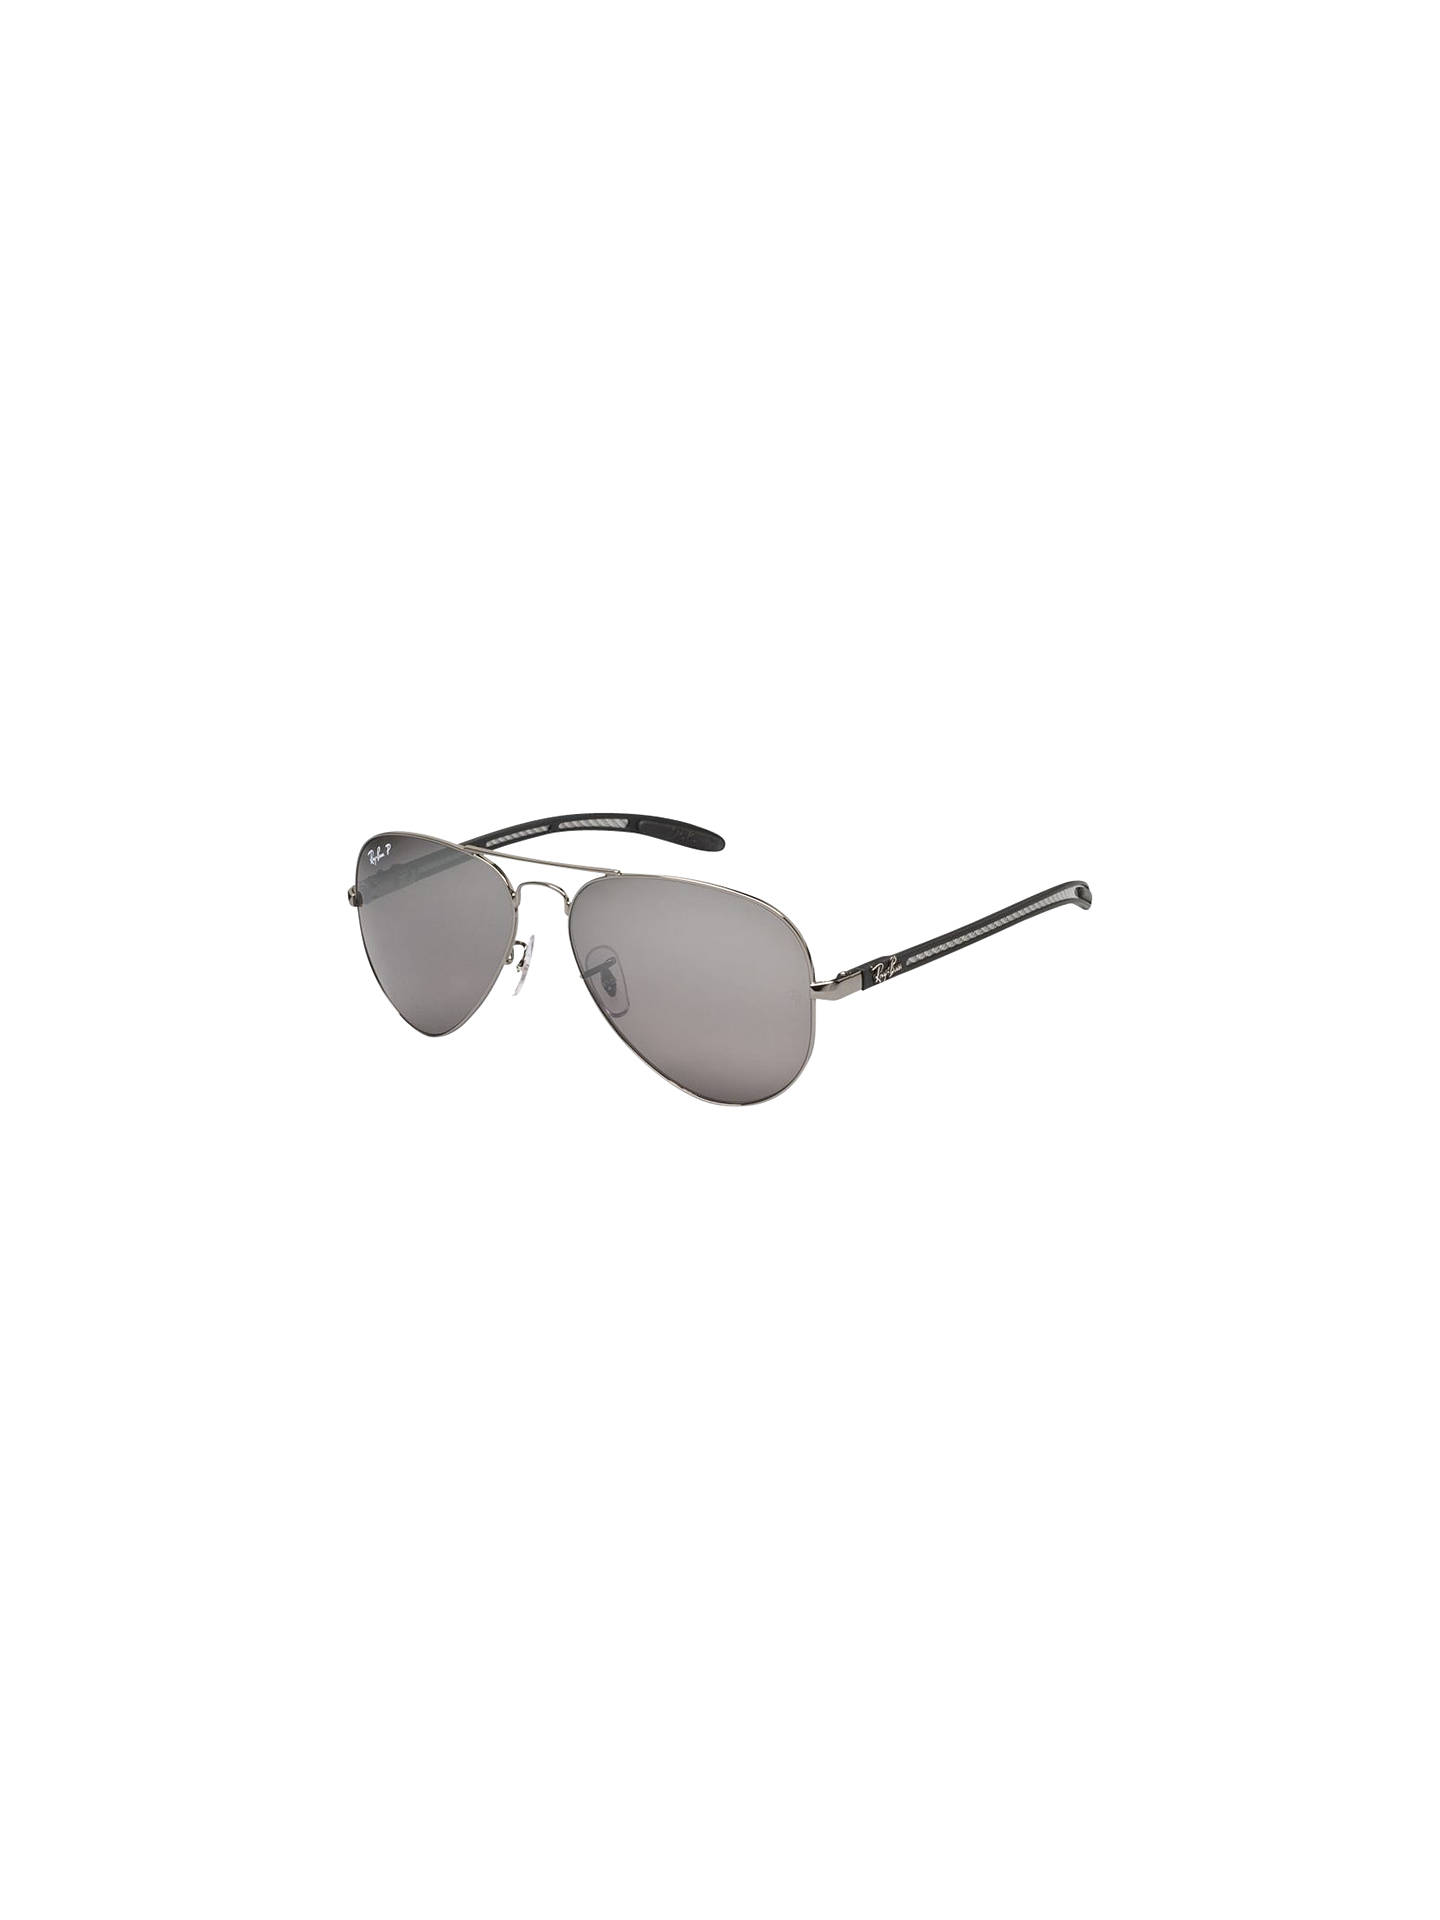 3989f6a8b74 Ray-Ban RB8307 Aviator Metal Frame Polarised Sunglasses at John ...